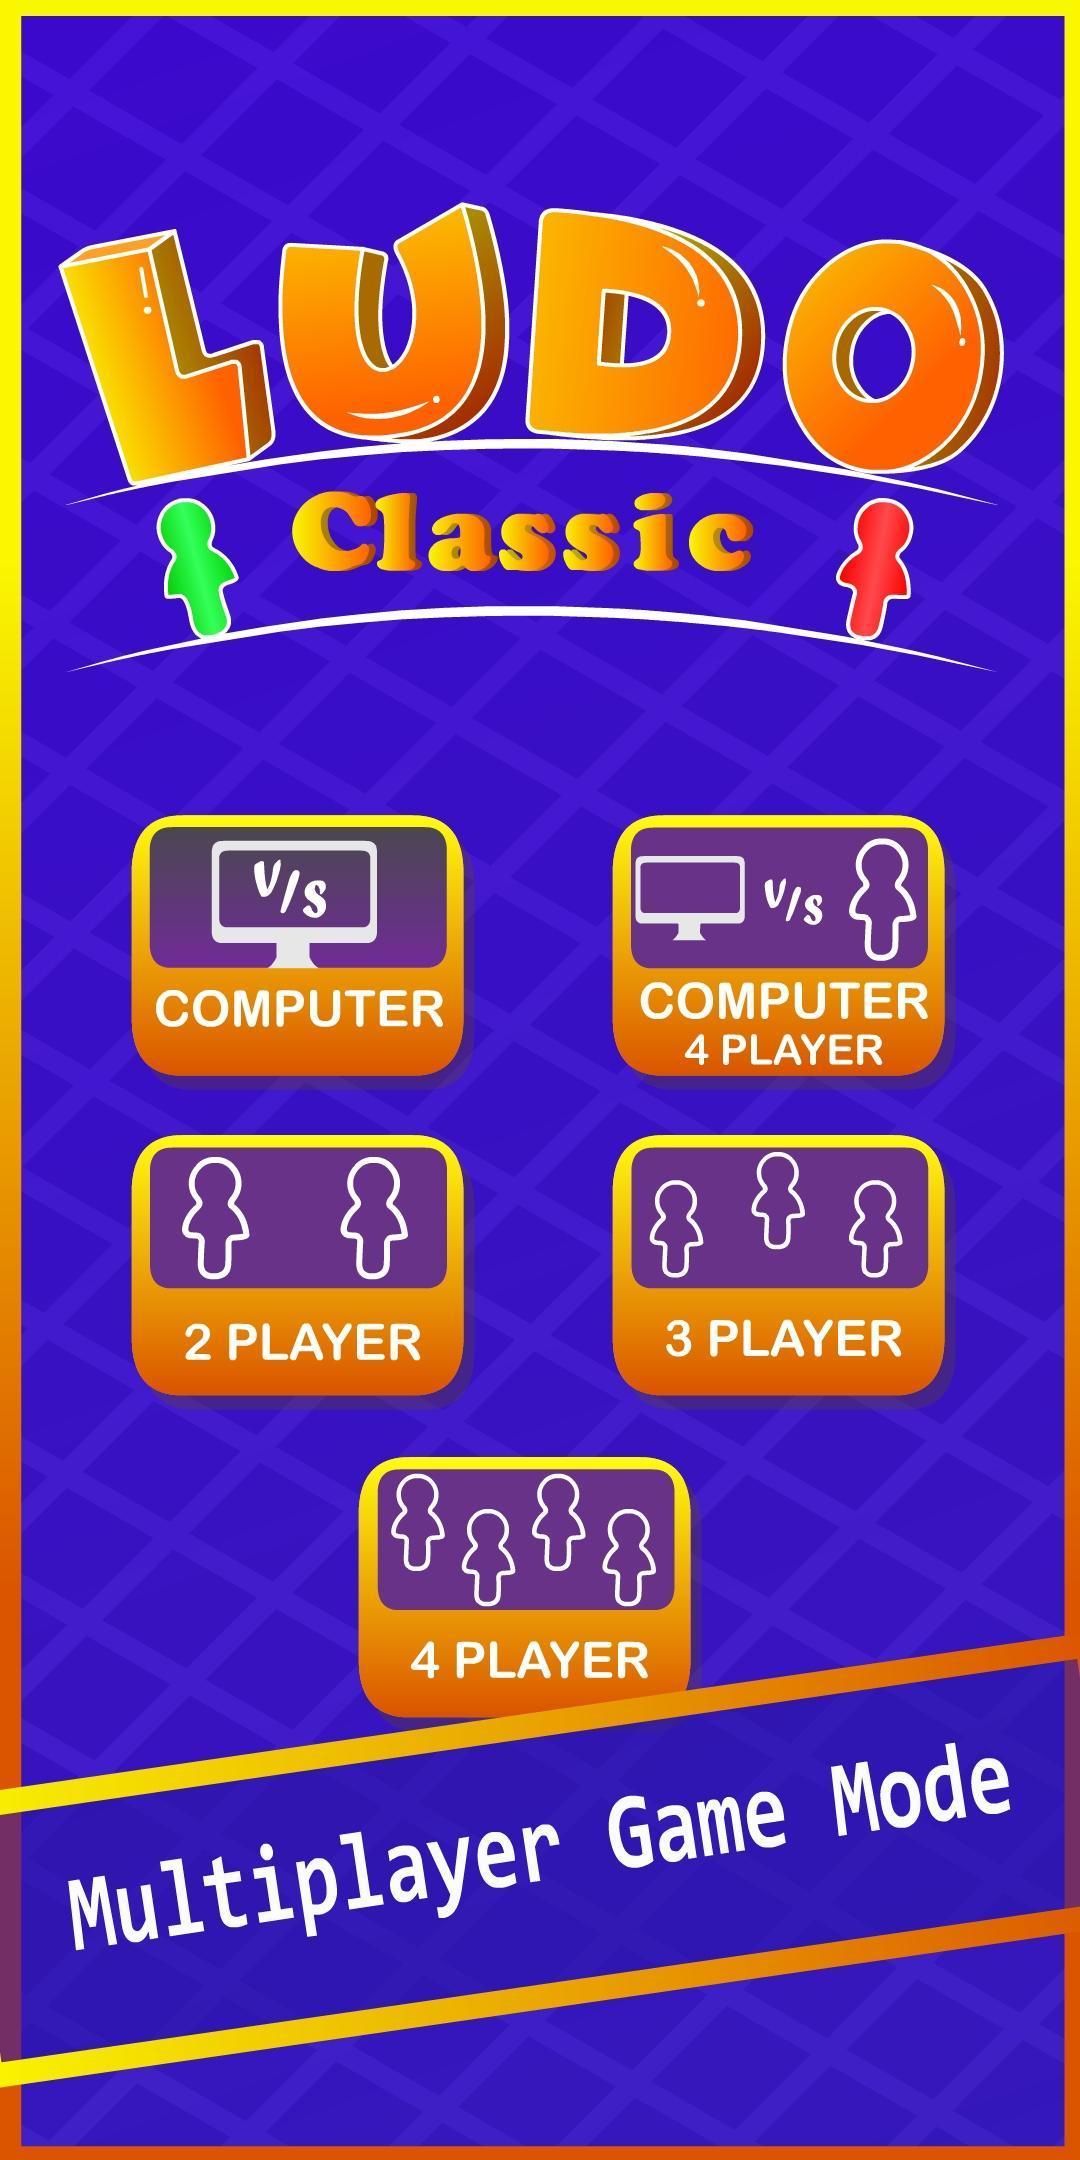 Ludo Club - Ludo Classic - King of Board Games 👑 1.5 Screenshot 4